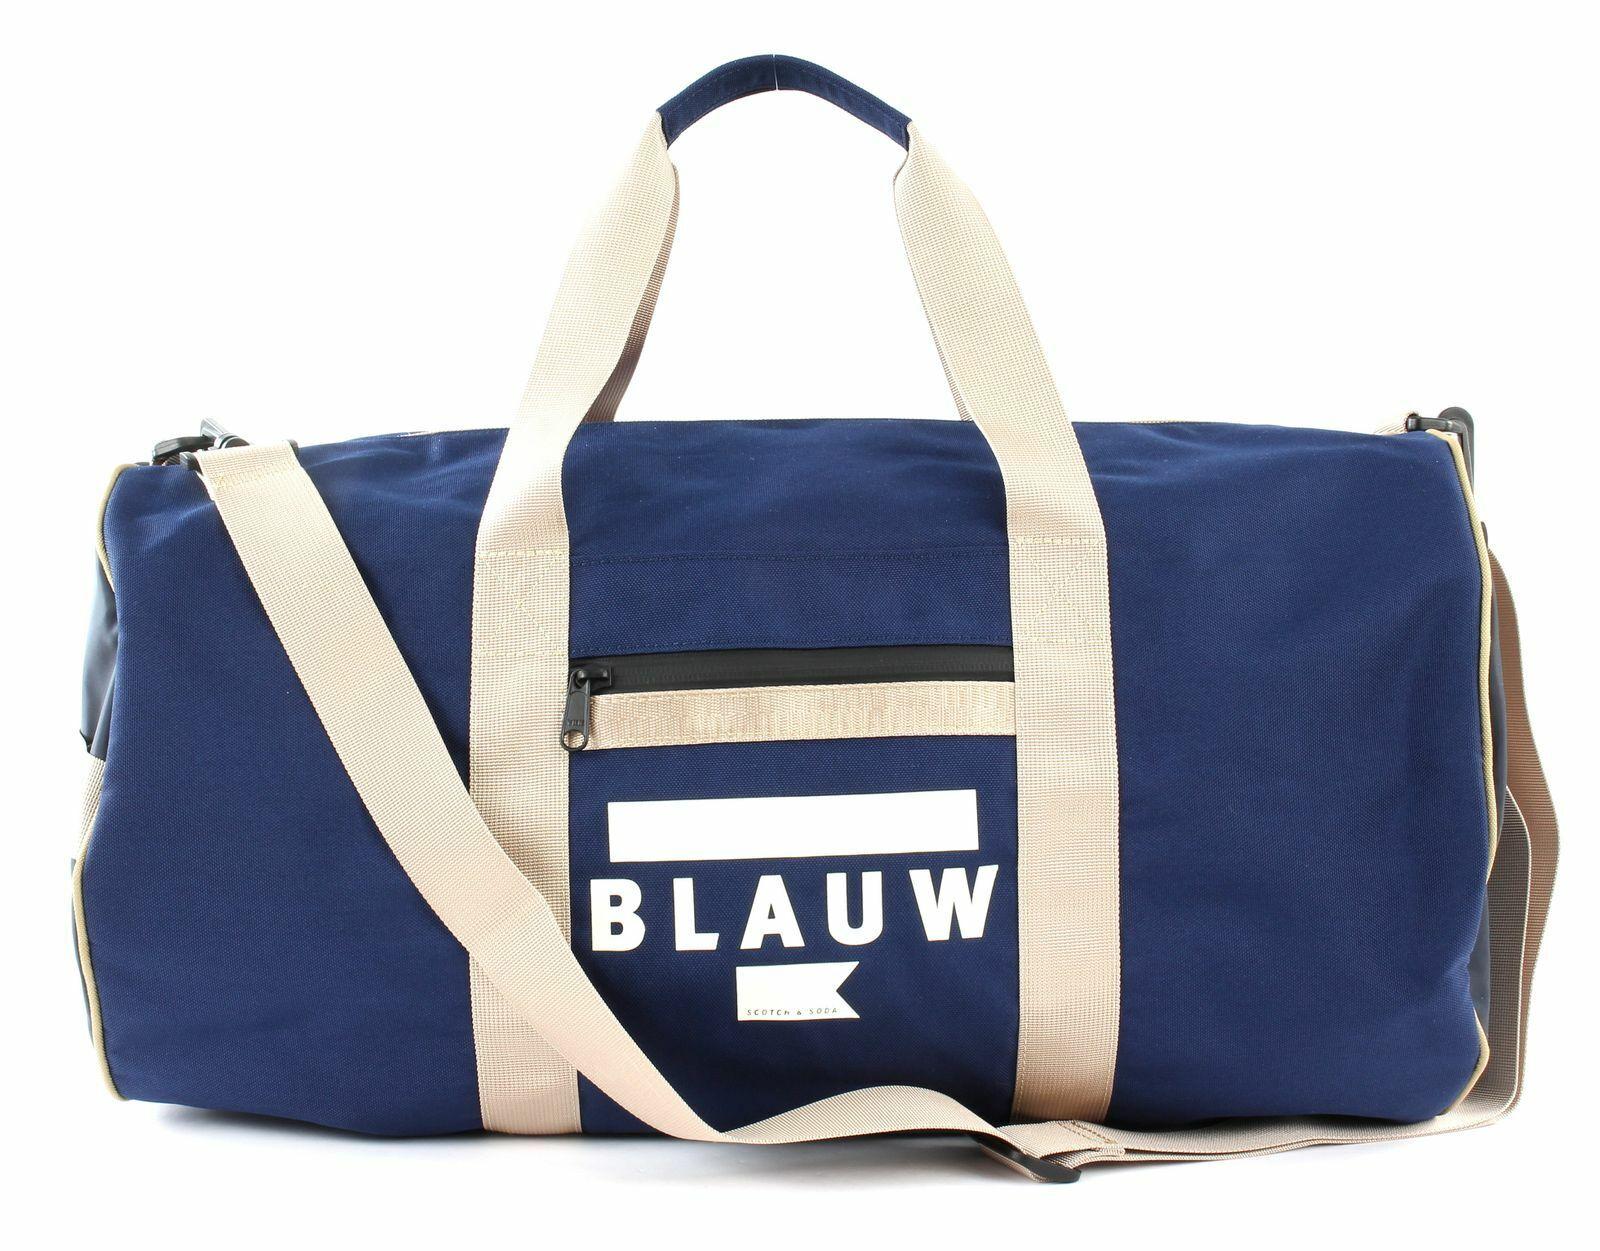 SCOTCH & SODA Ams Azulw Off Duty Bag Combo A